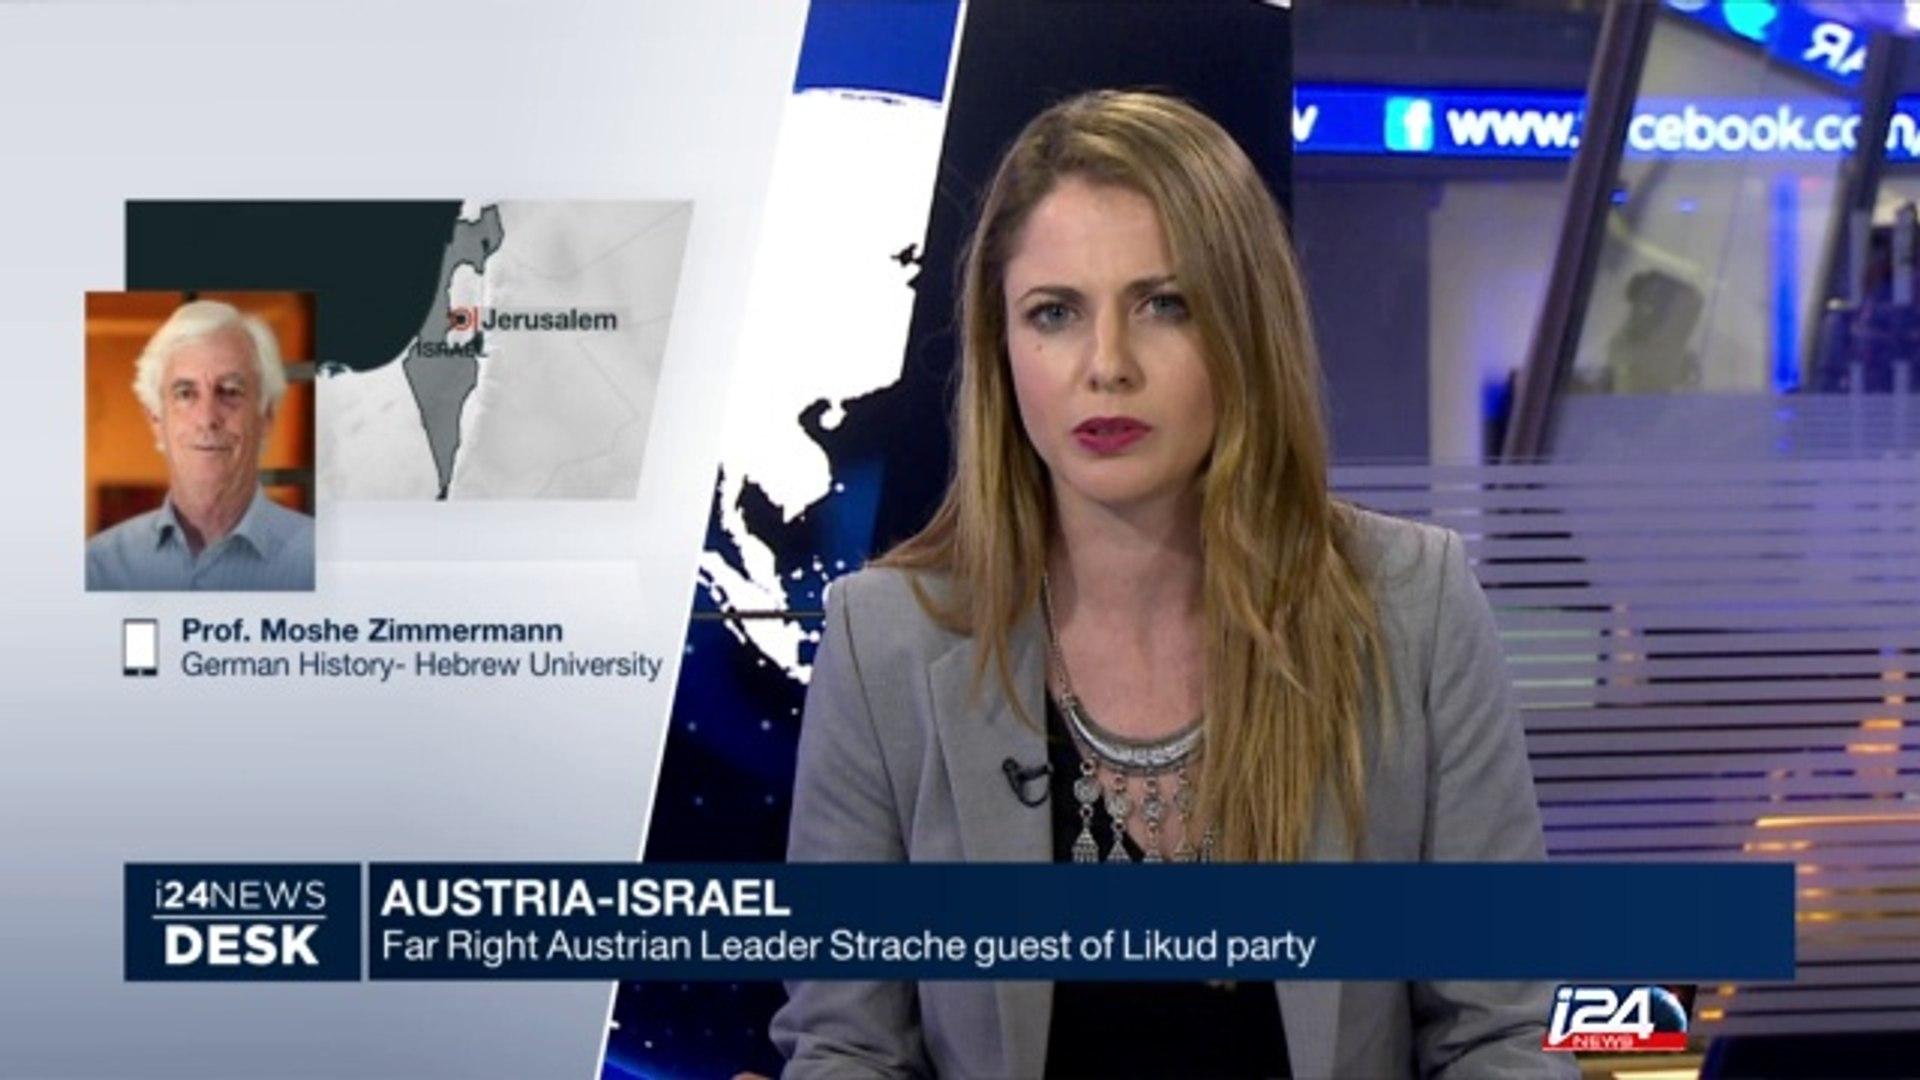 Austria-Israel: Far right Austrian leader guest of Likud party